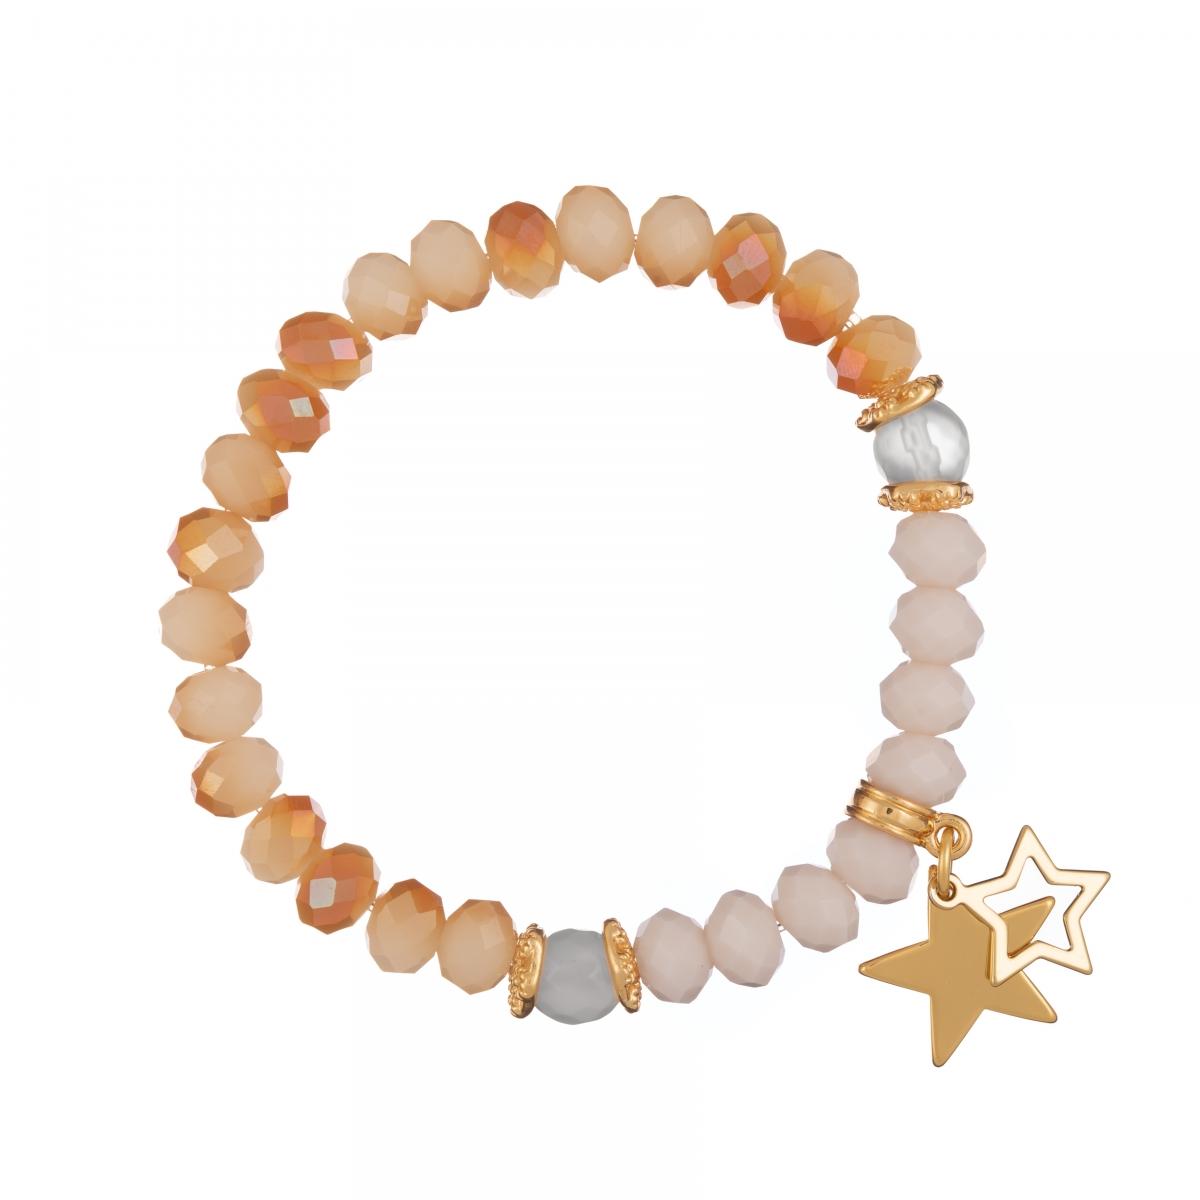 Náramok Mineral Gold Peach Jadeit Gold Stars